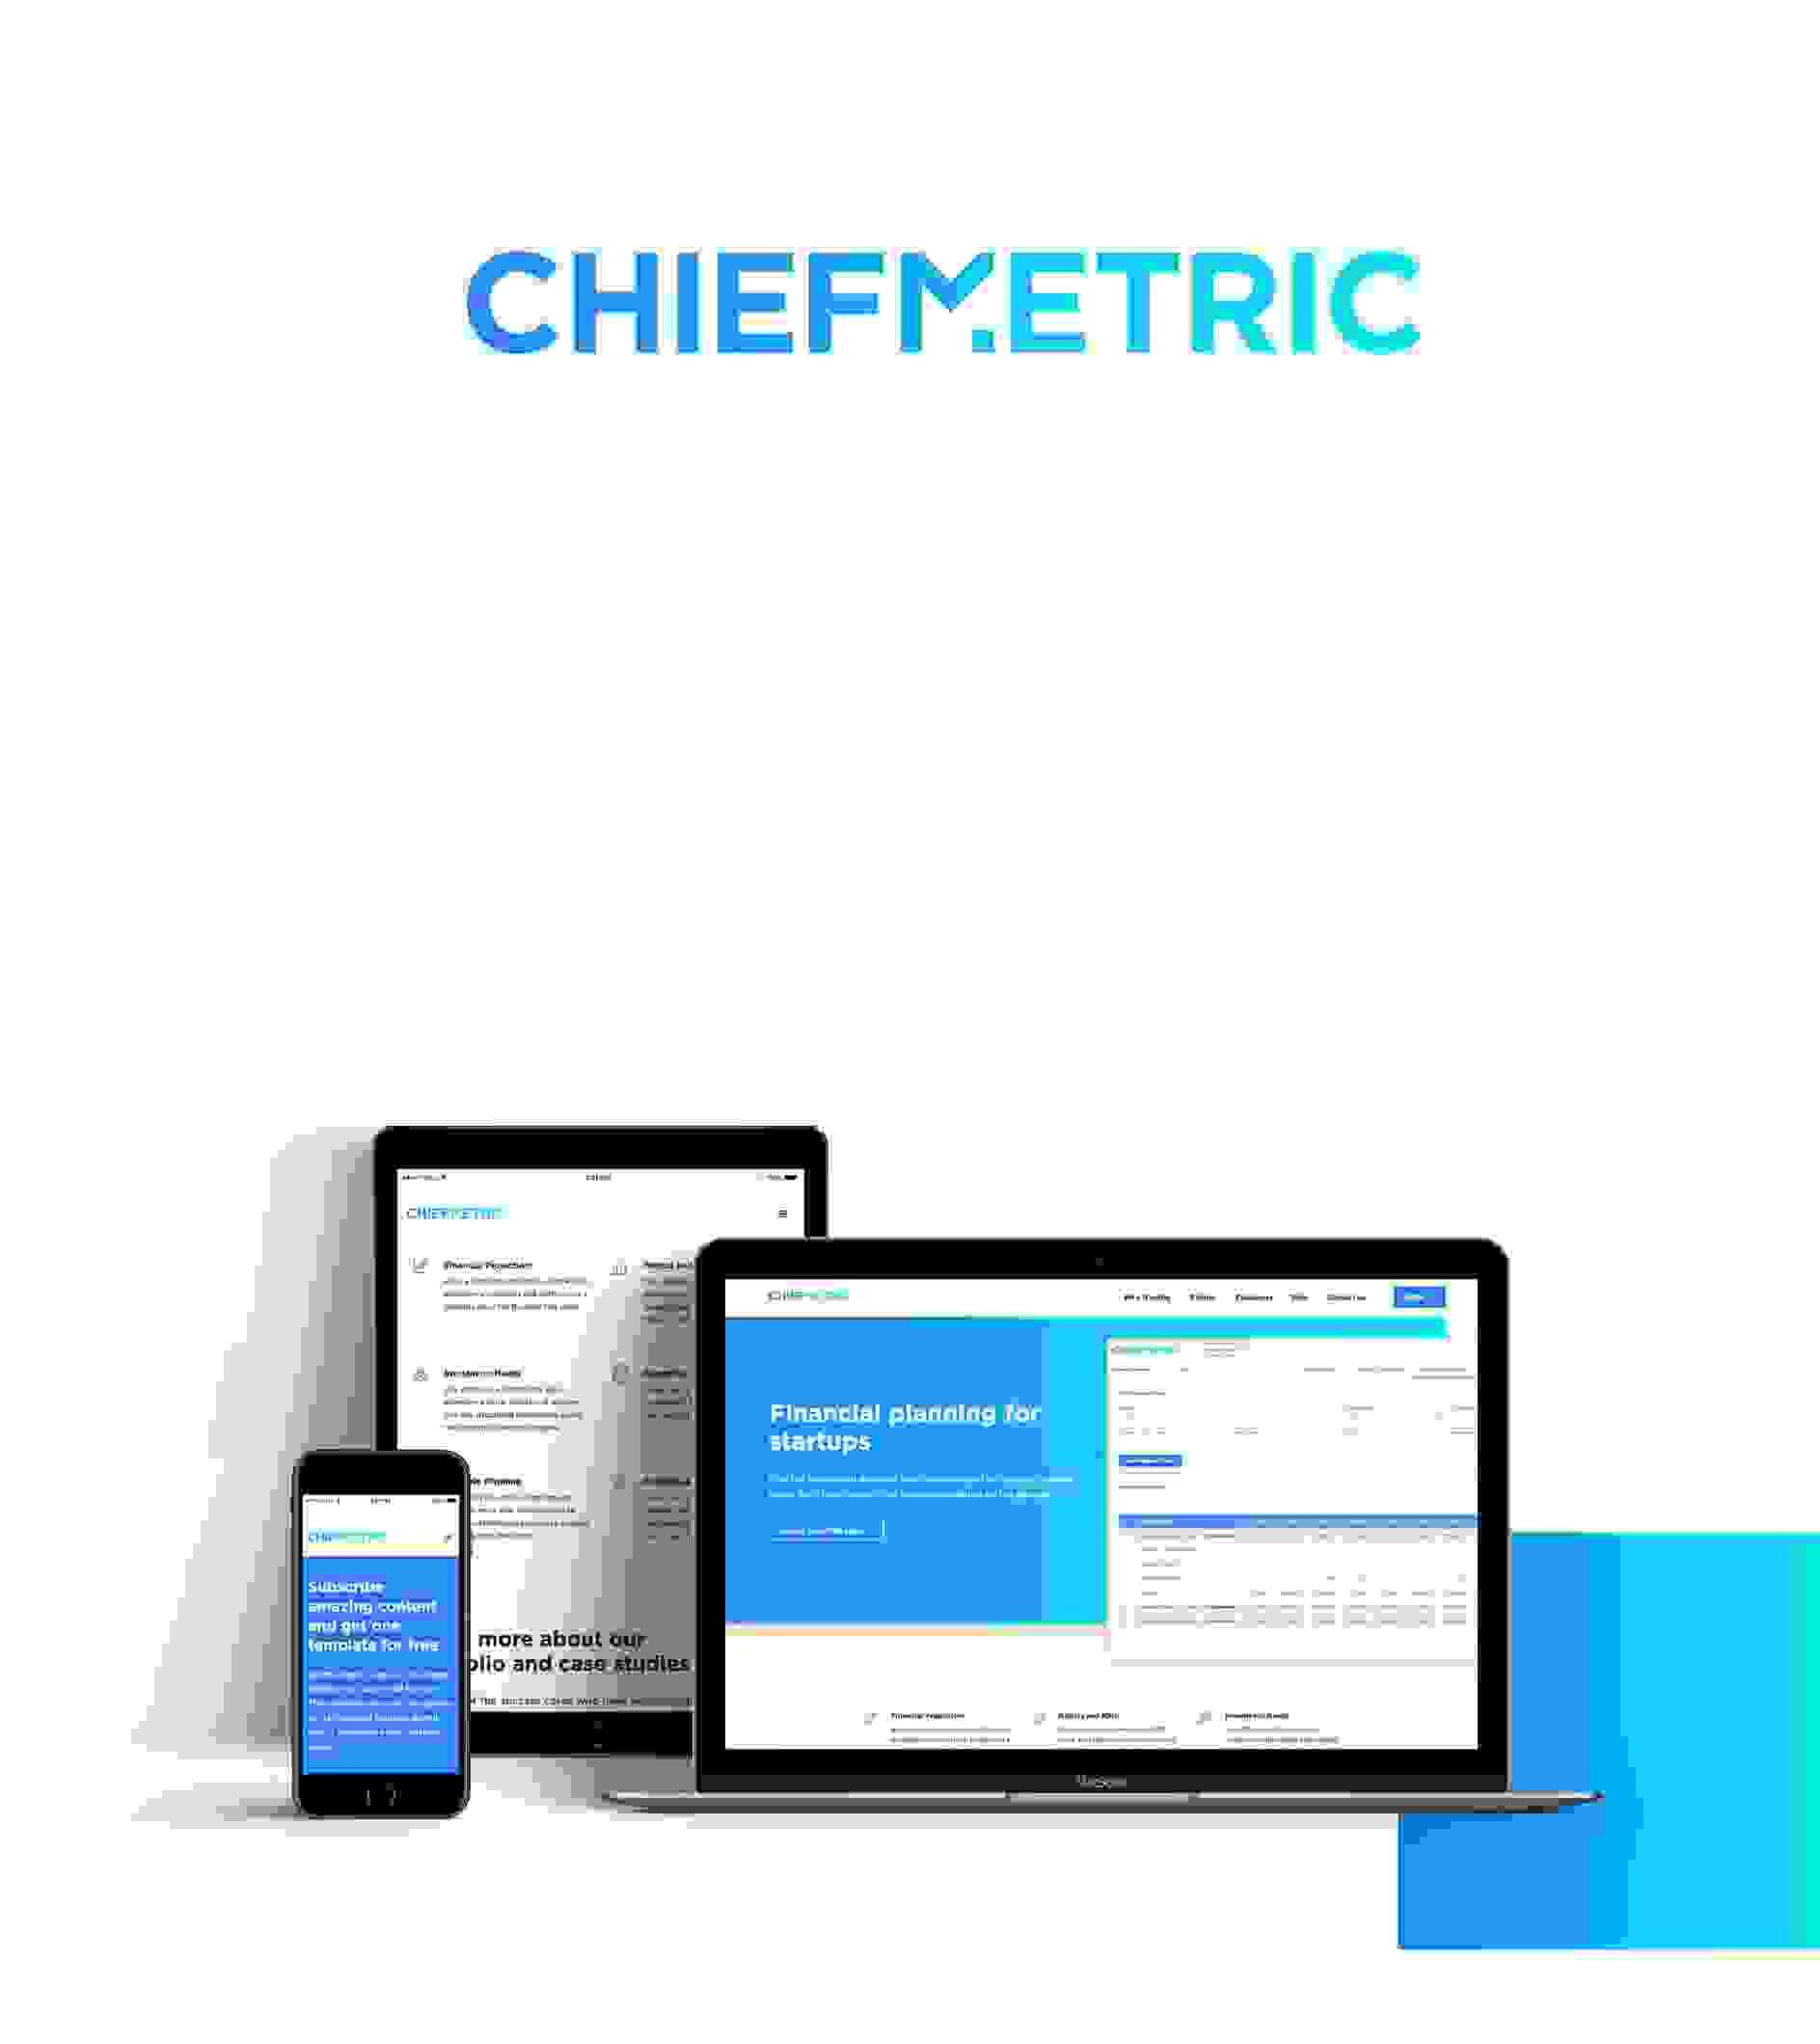 Chiefmetric-02